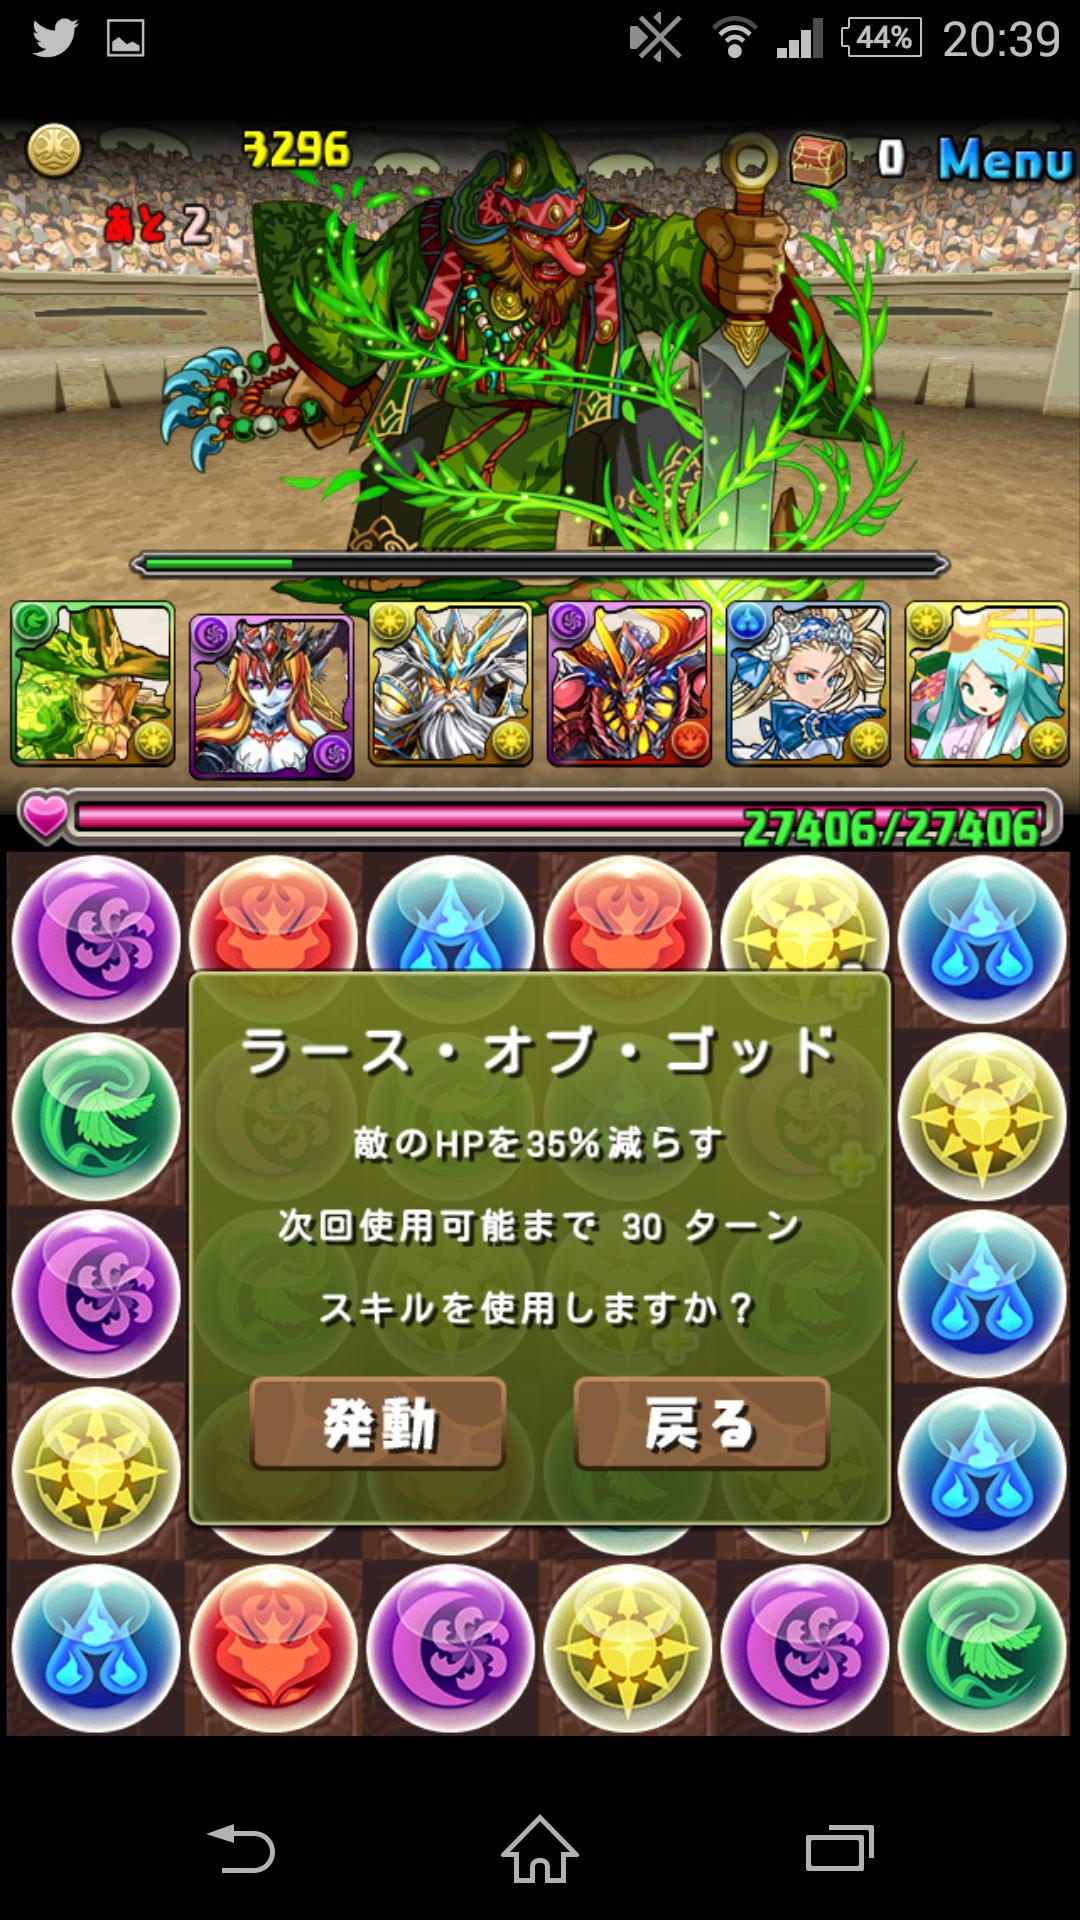 Screenshot_2015-01-29-20-39-38.png